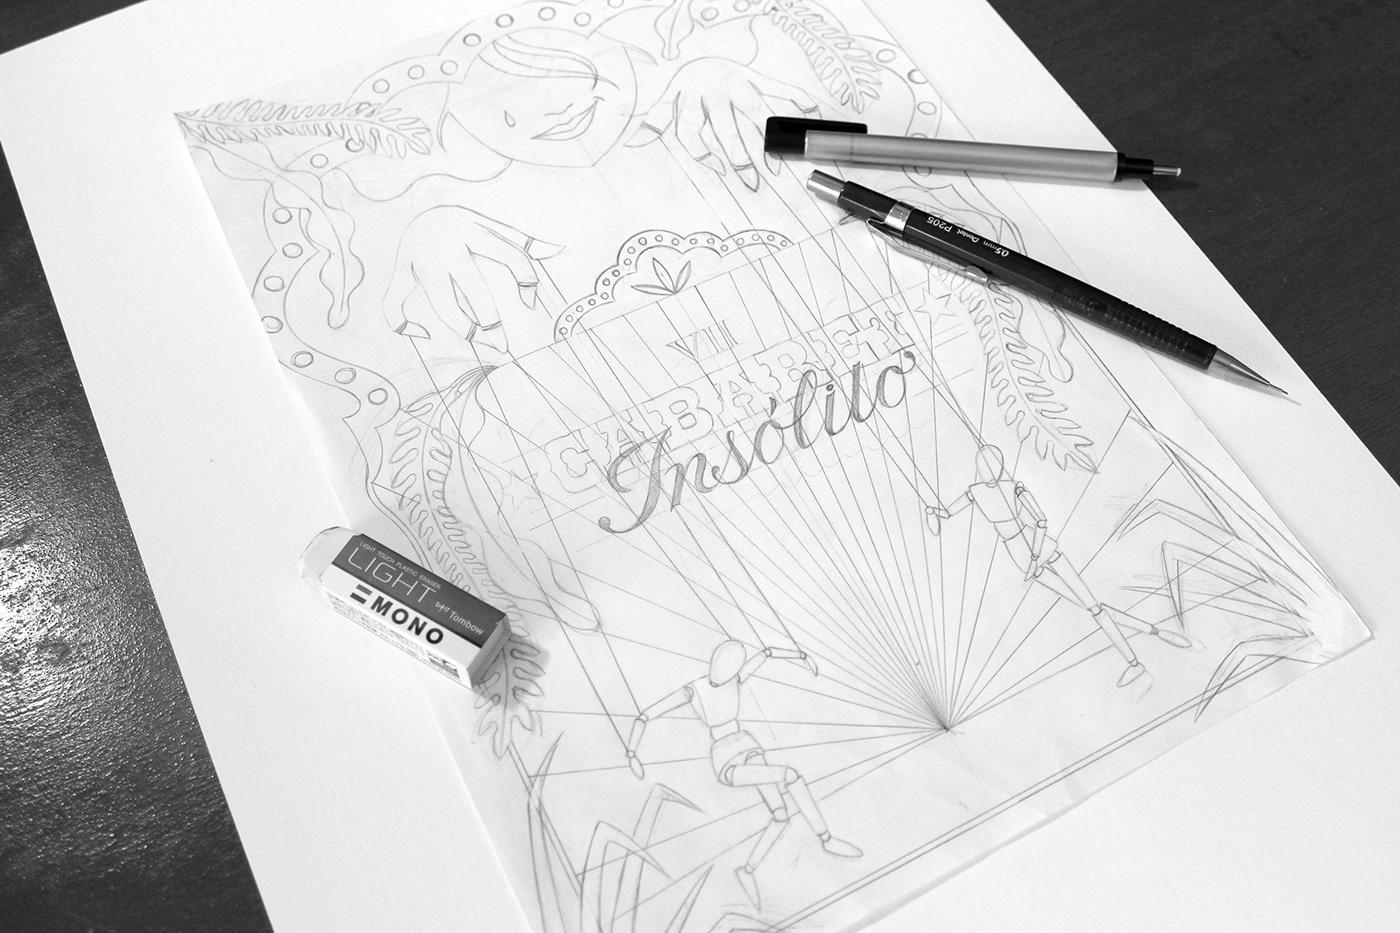 Image may contain: sketch, drawing and handwriting